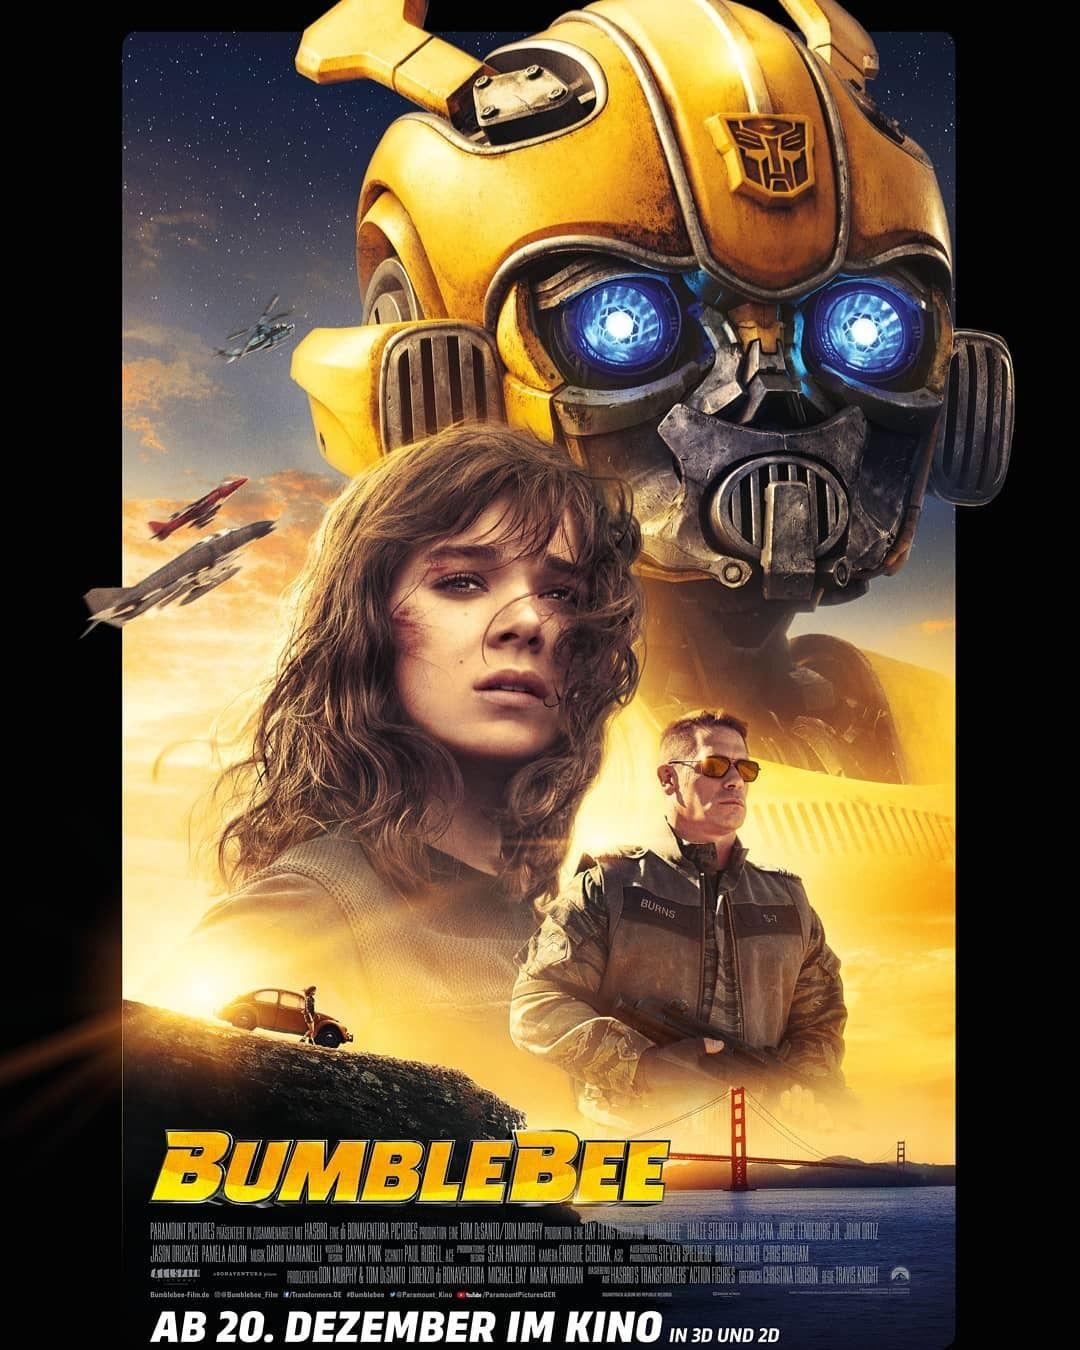 Bumblebee Transformers Film Ganze Filme Filme Stream